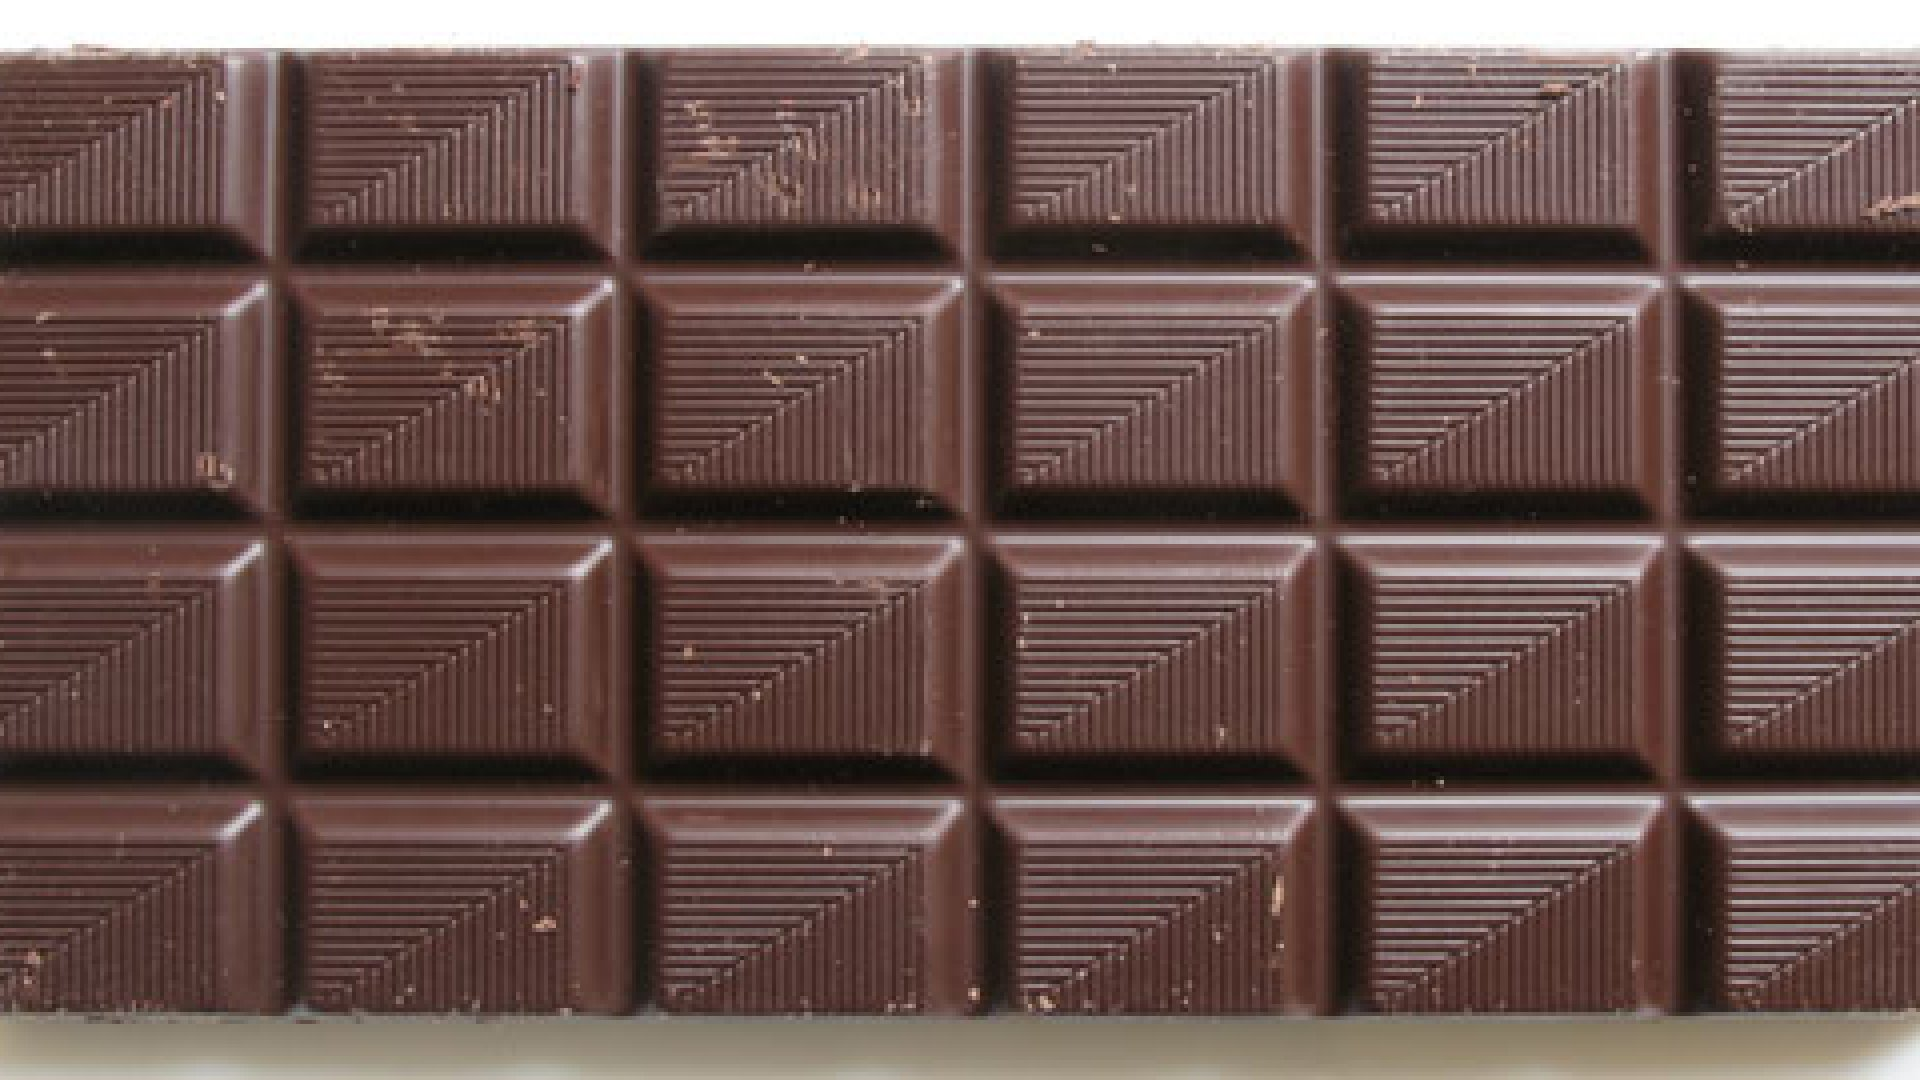 Export or Die: How Divine Chocolate Broke into the U.S.